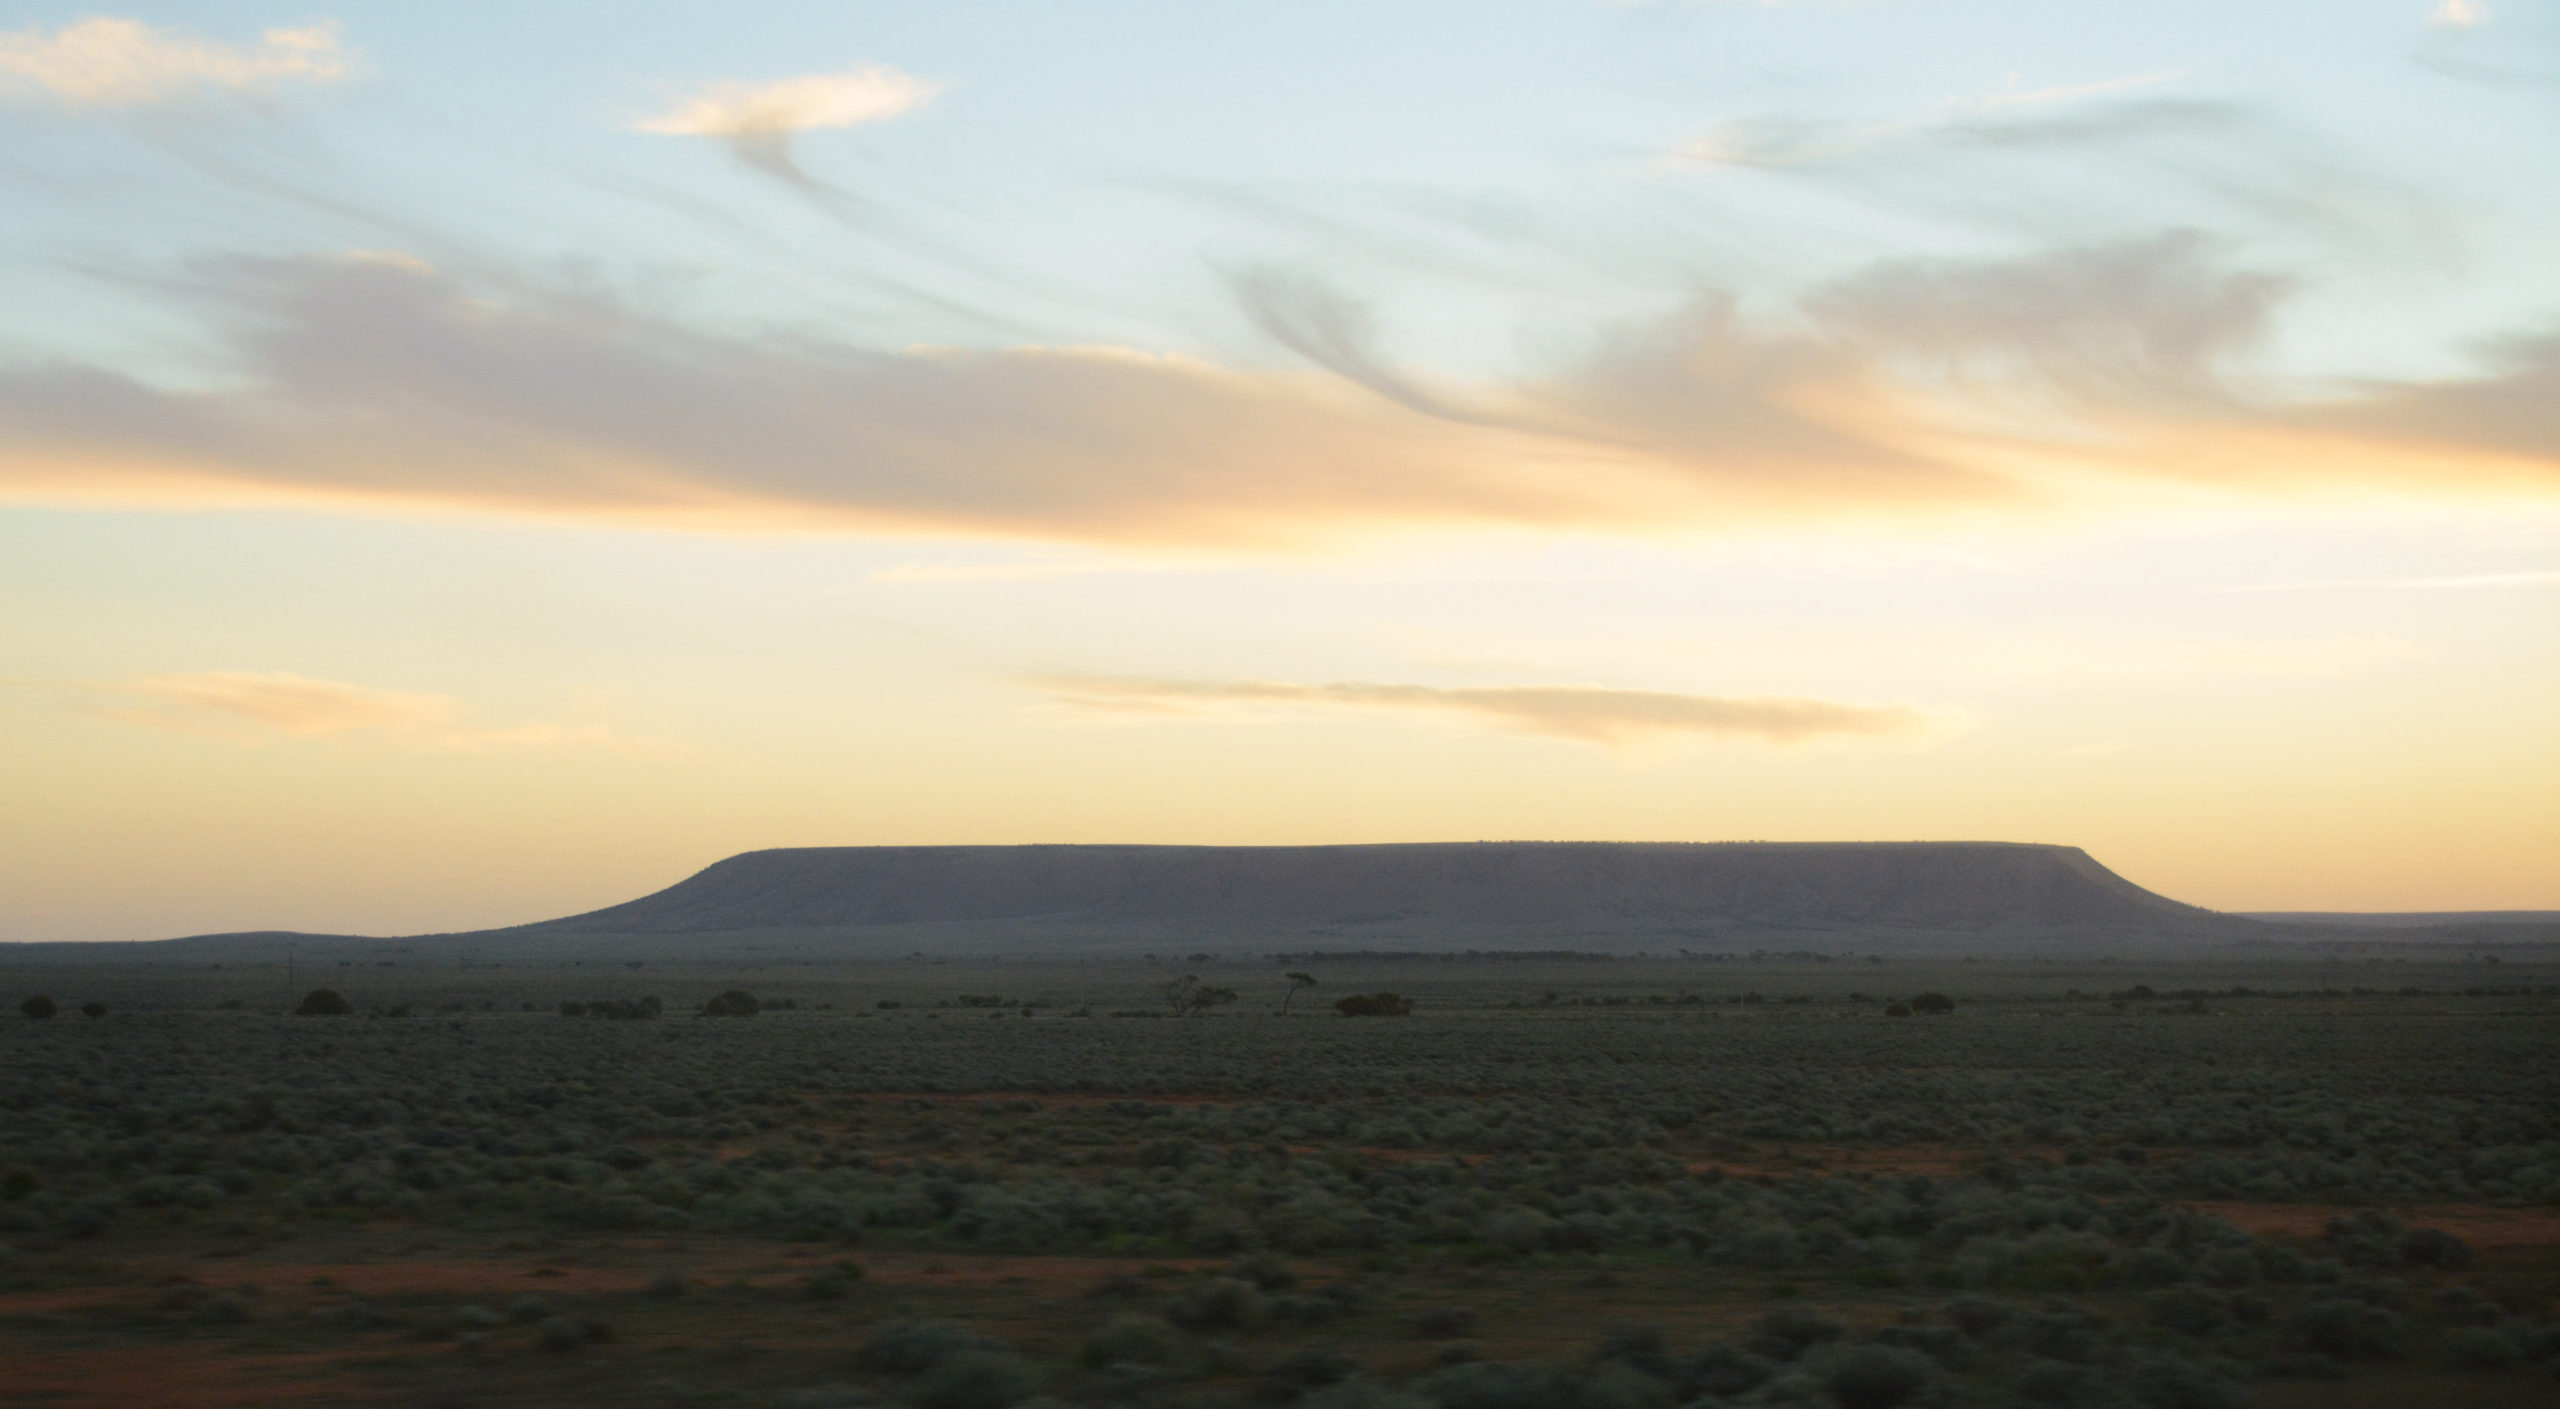 Tafelberg in New South Wales während des Sonnenuntergangs